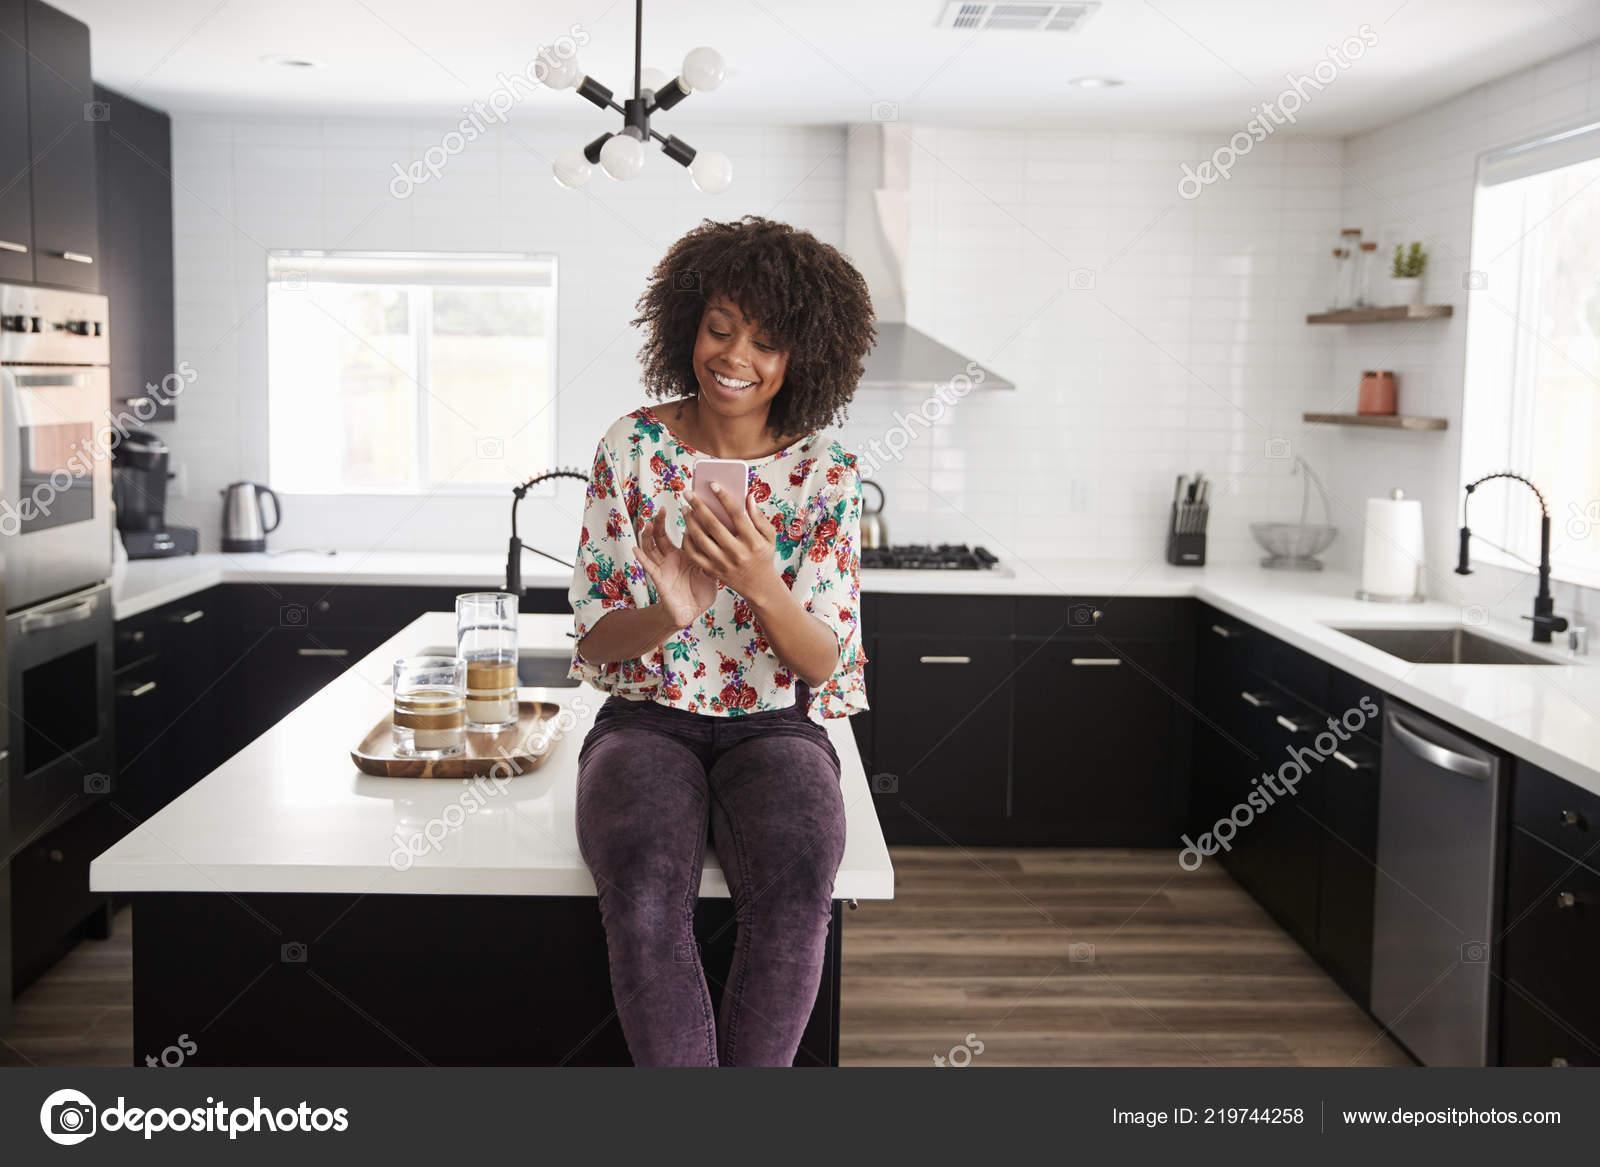 Frau Hause Sitzen Auf Kucheninsel Wahrend Mobiltelefon Stockfoto